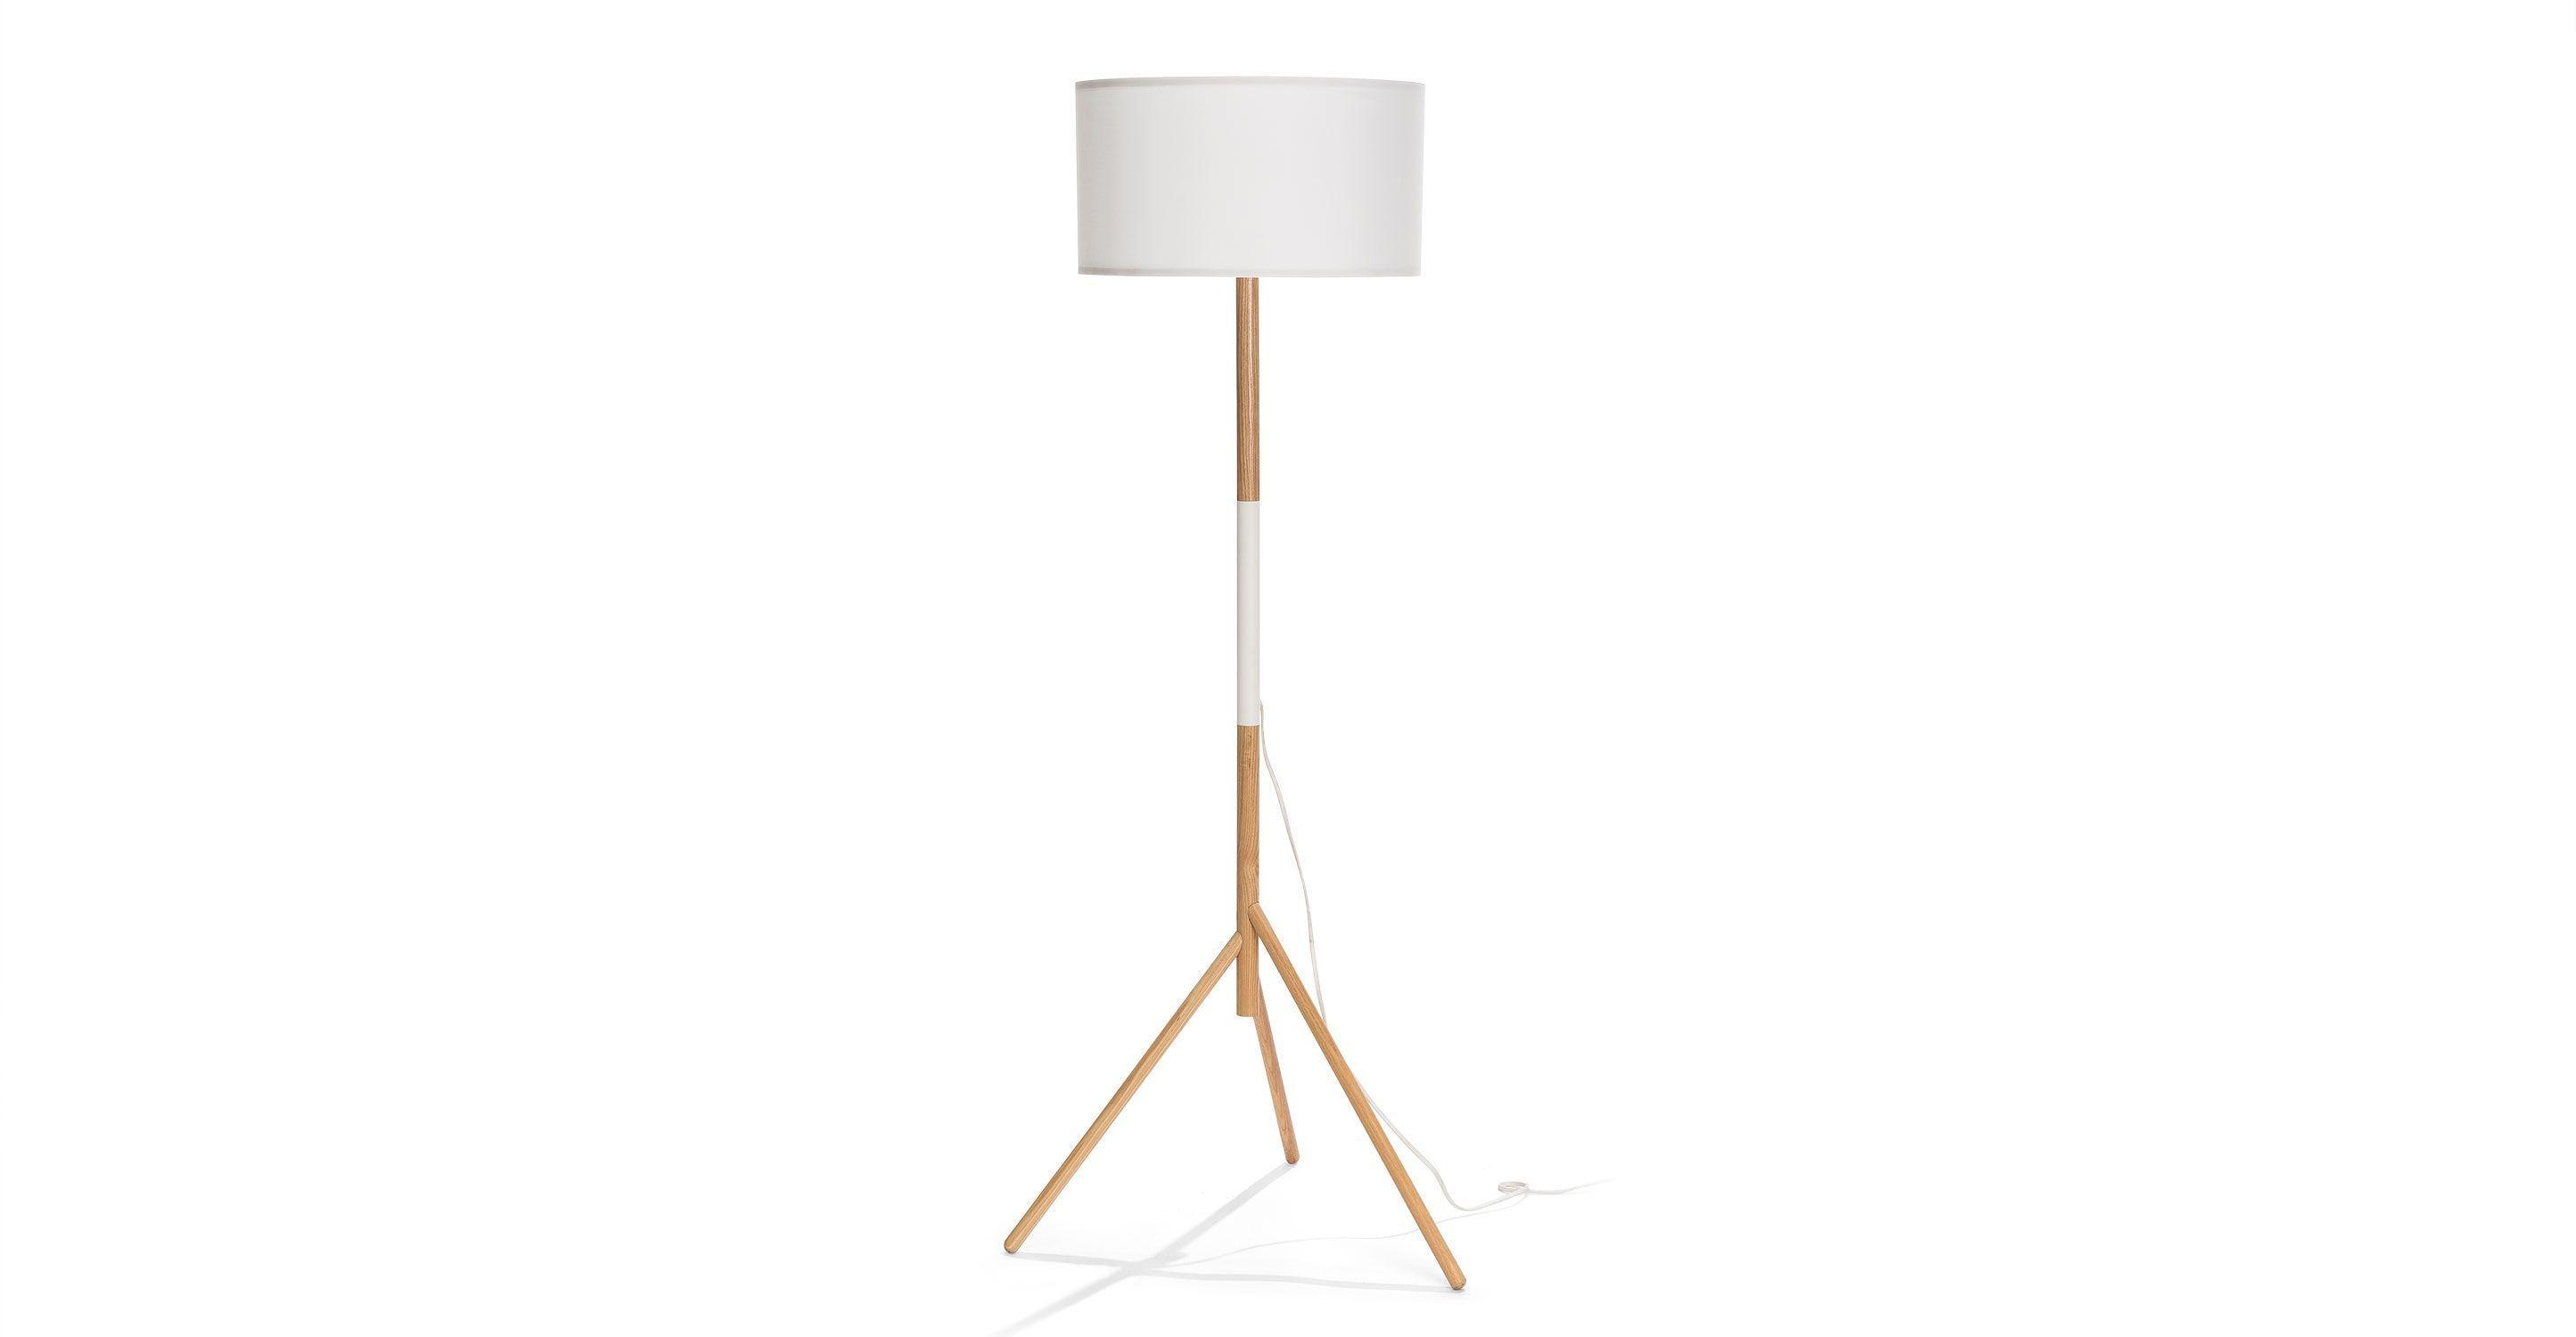 Stilt White Floor Lamp Lighting Article Modern Mid Century And Scandinavian Furniture 199 Lampbedroom White Floor Lamp Black Floor Lamp Floor Lamp